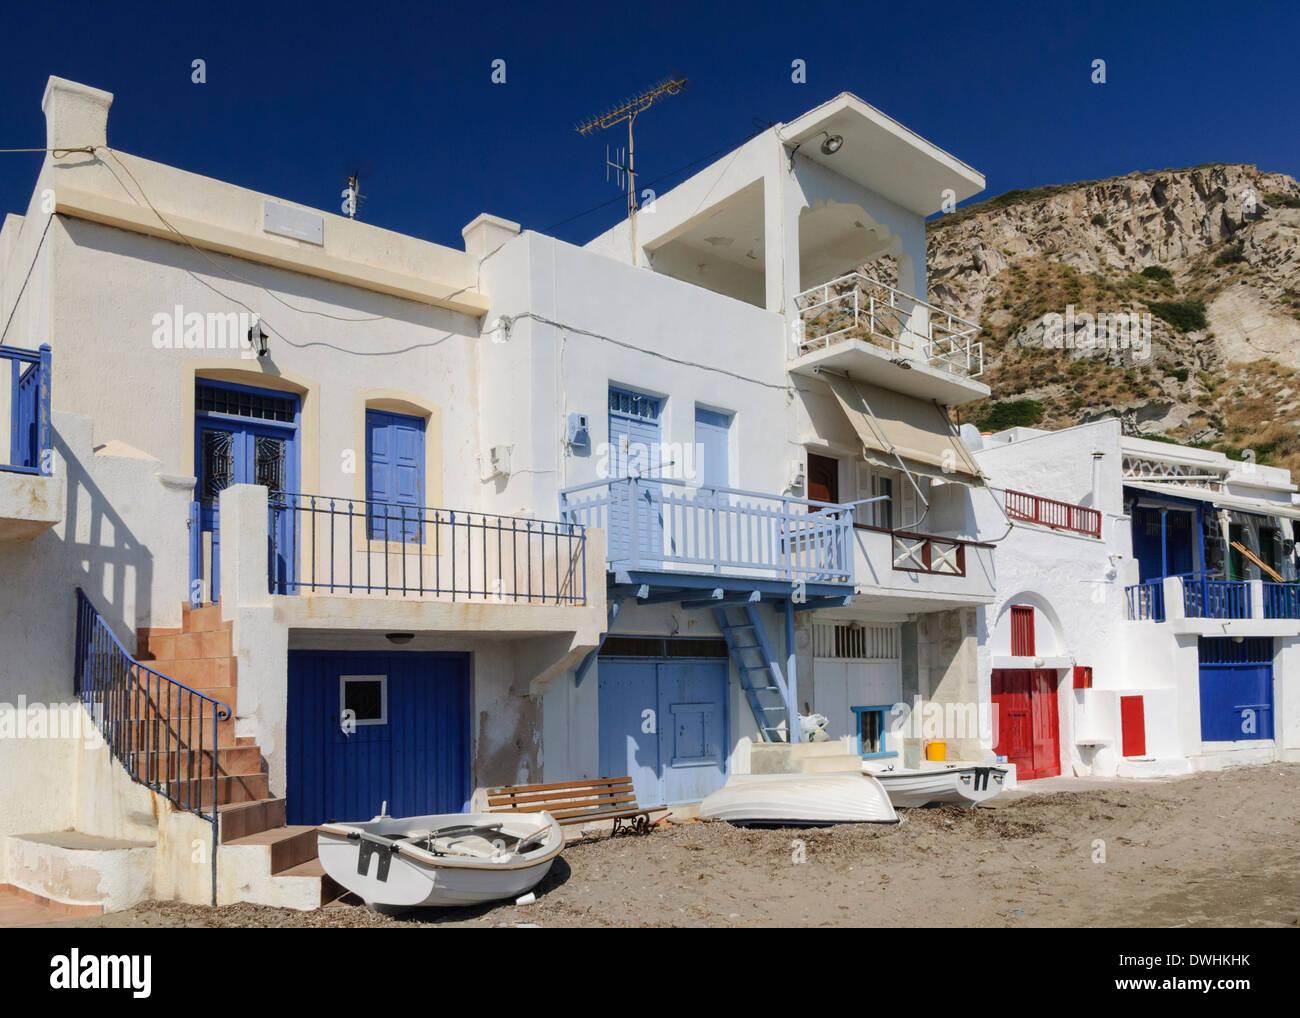 Syrmata, fishermen's houses in the tiny seaside village of Klima on Milos Island, Cyclades, Greece Stock Photo